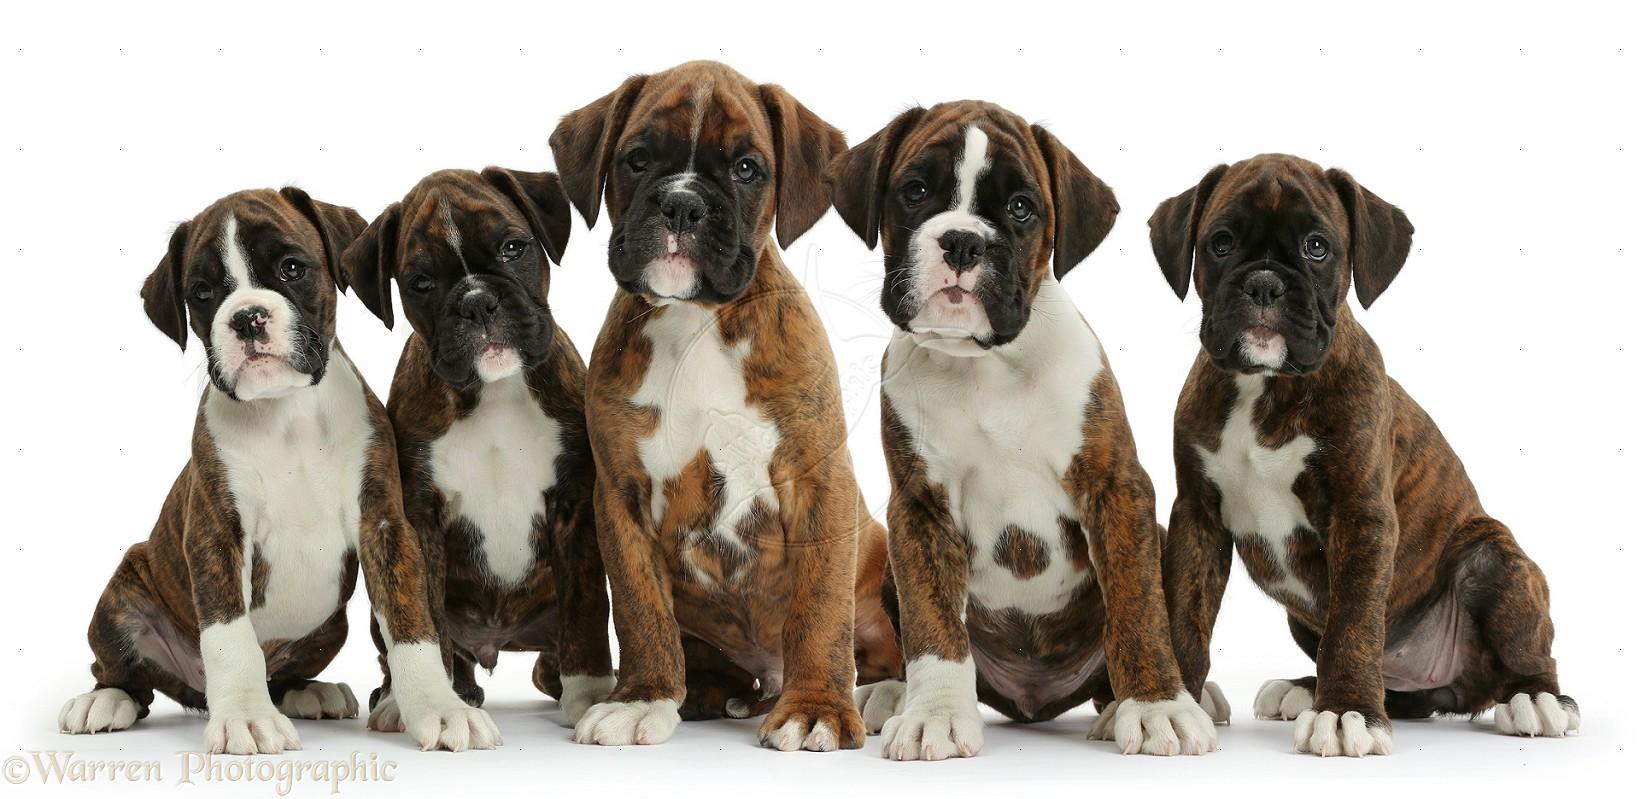 Five Boxer puppies, 8 weeks old